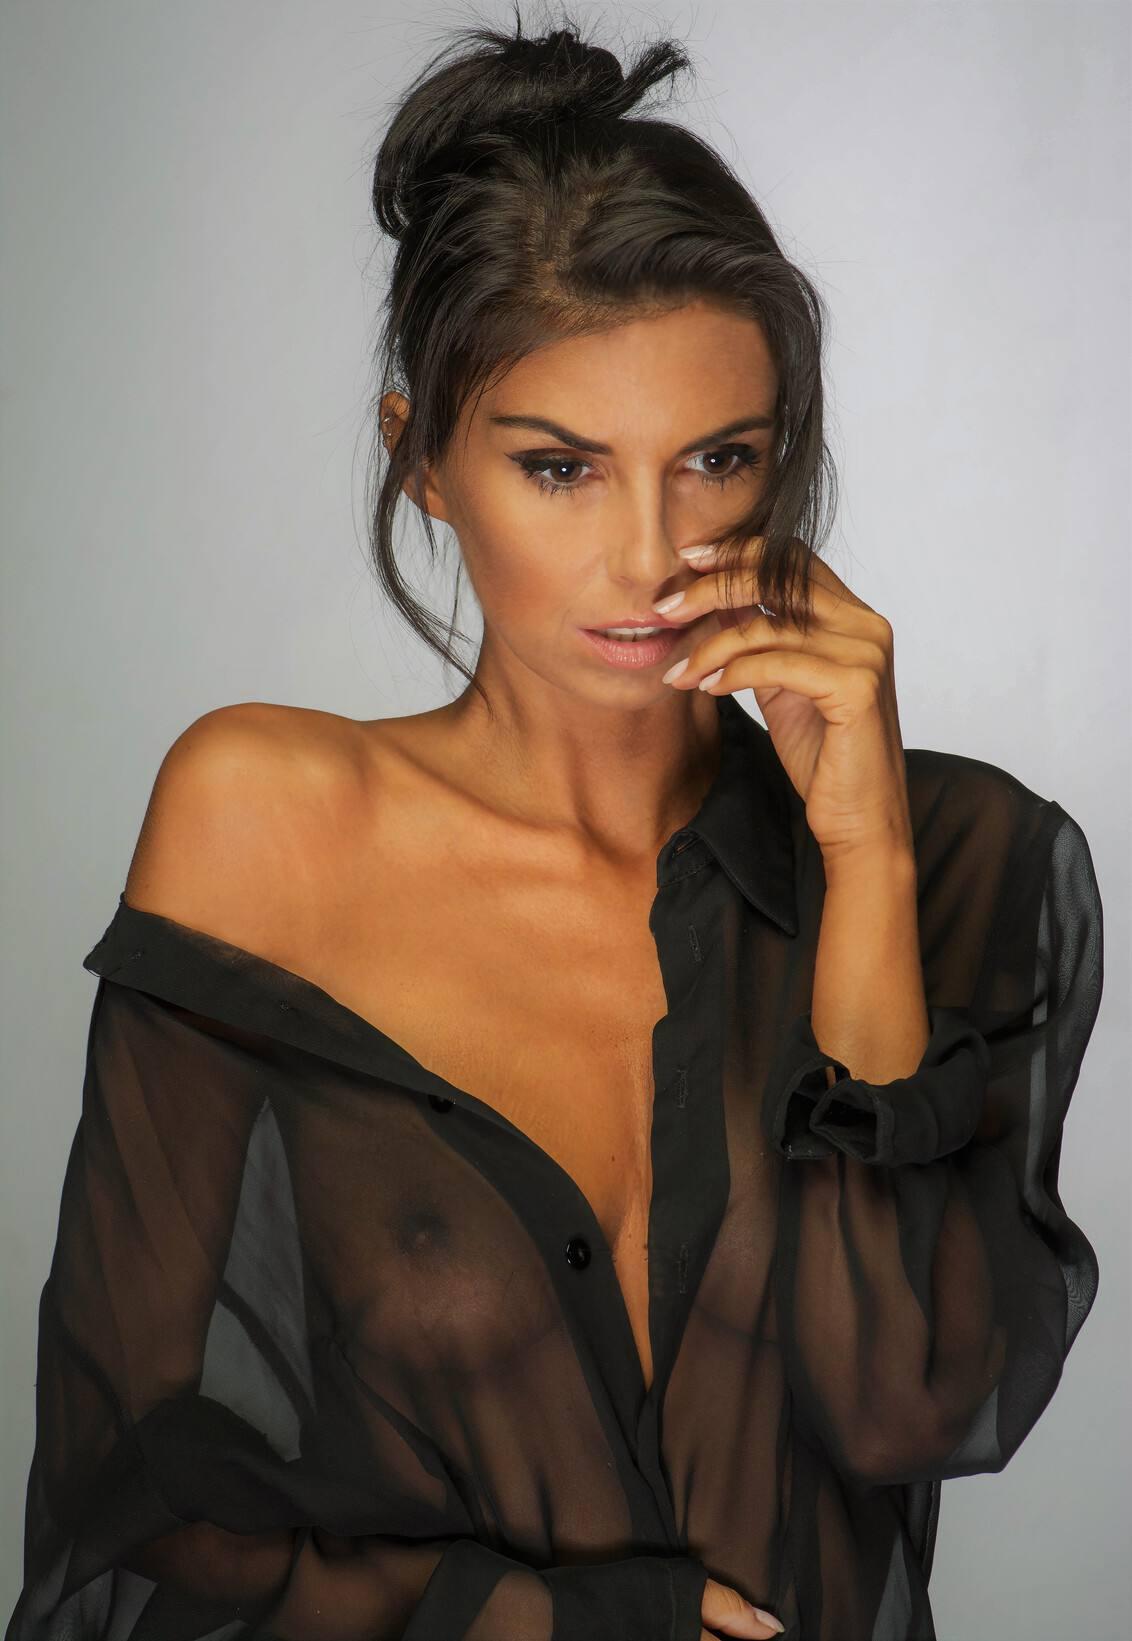 Laura Giraudi Sexy Braless Tits In Transparent Shirt